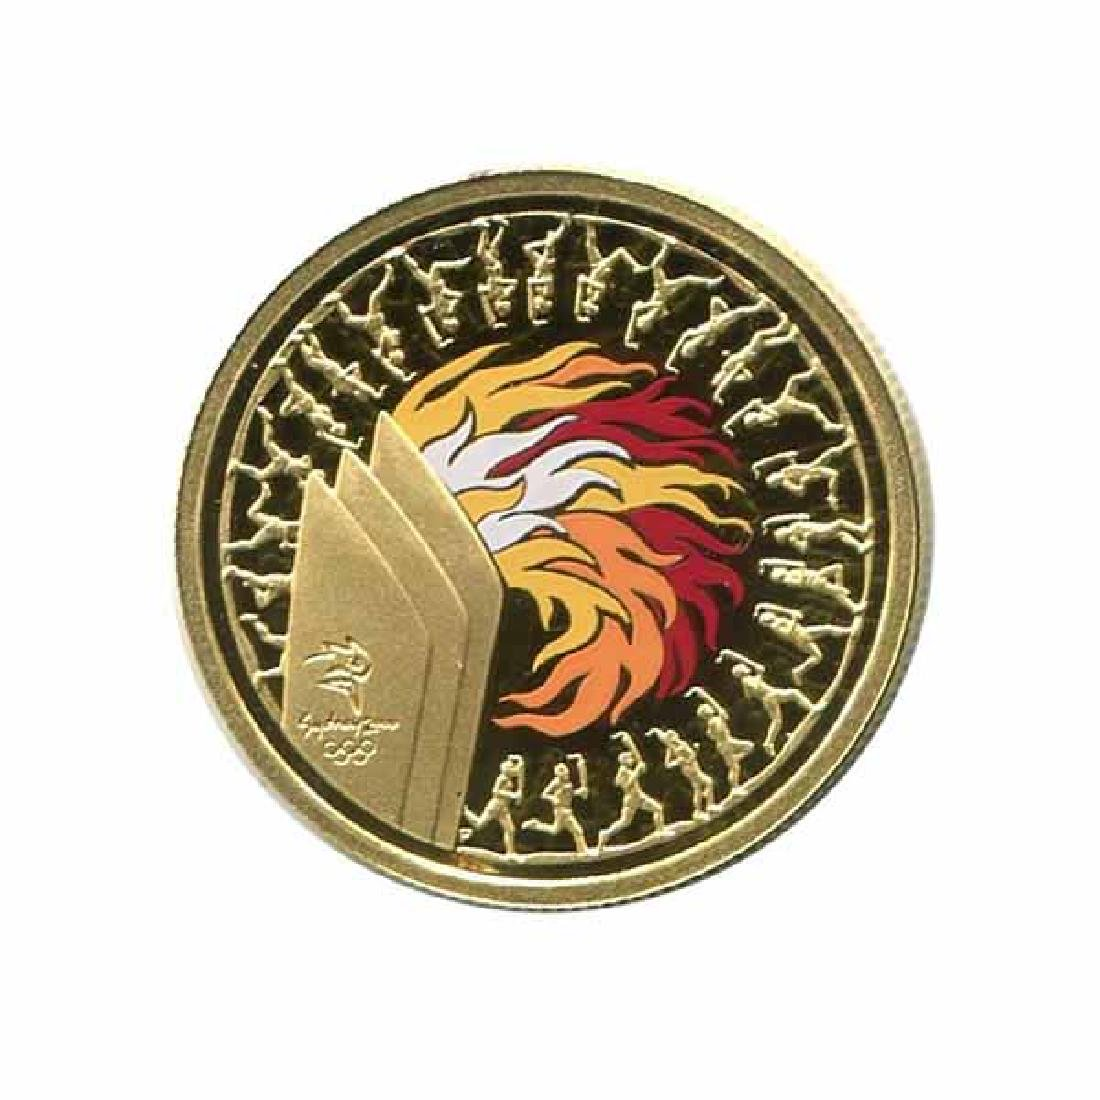 Australia $100 gold PF 2000 Olympic Torch